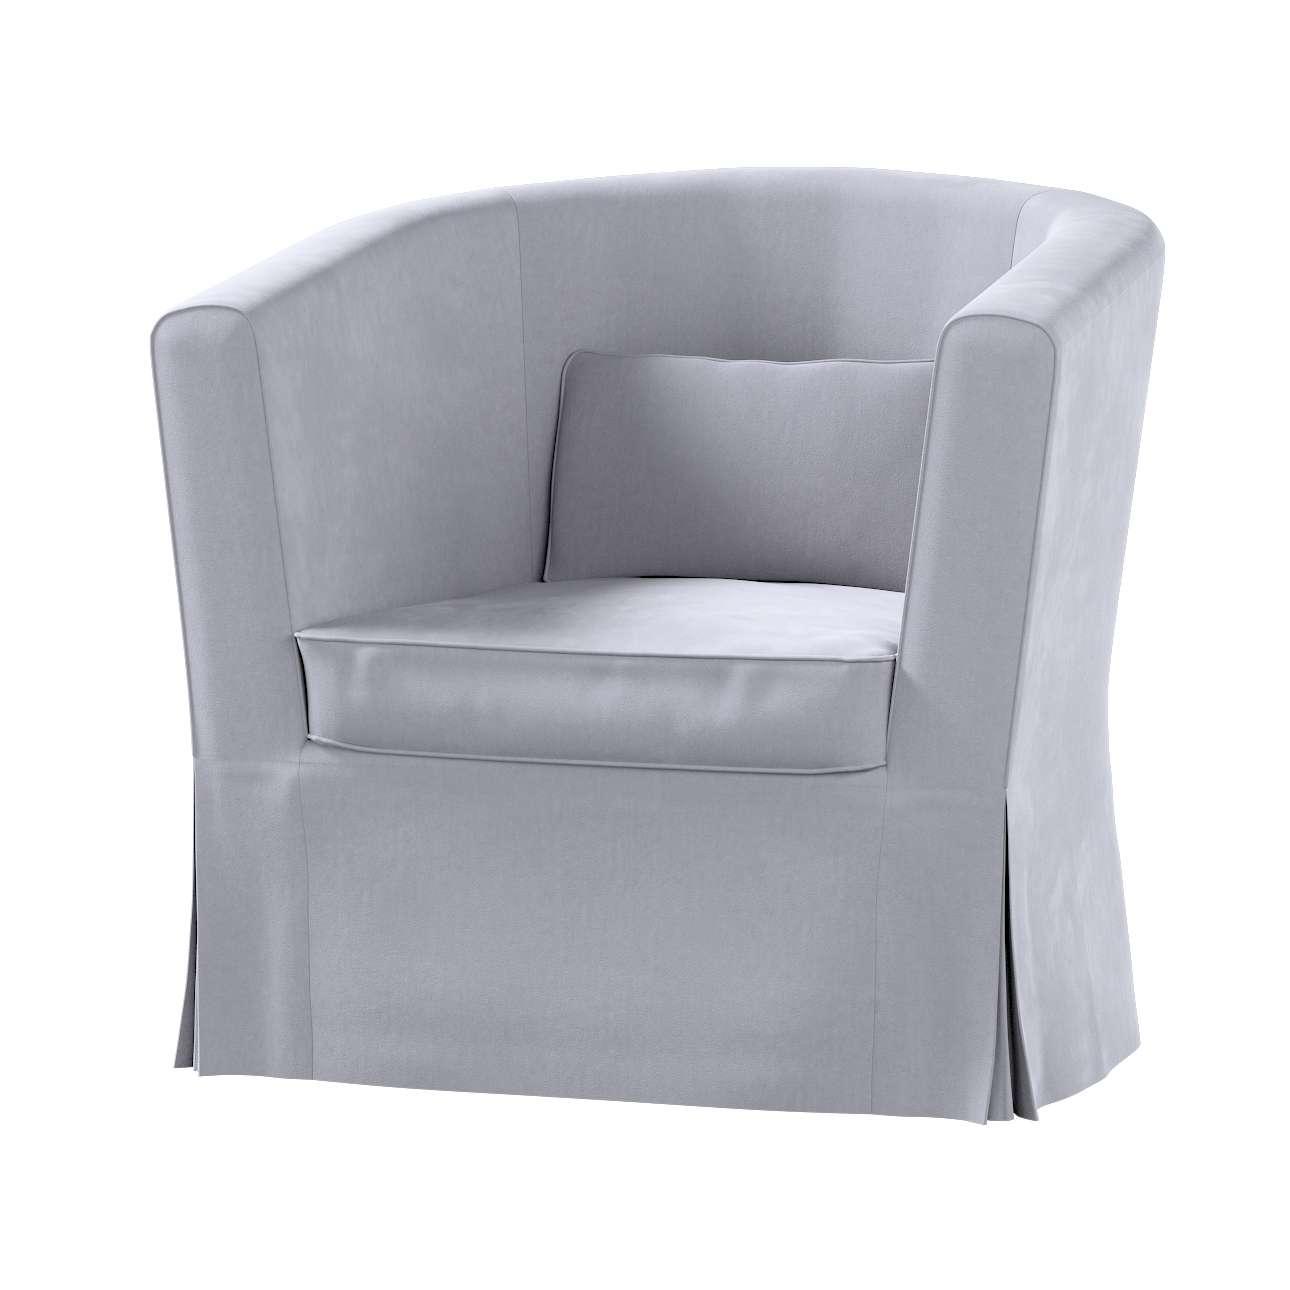 Pokrowiec na fotel Ektorp Tullsta w kolekcji Velvet, tkanina: 704-24